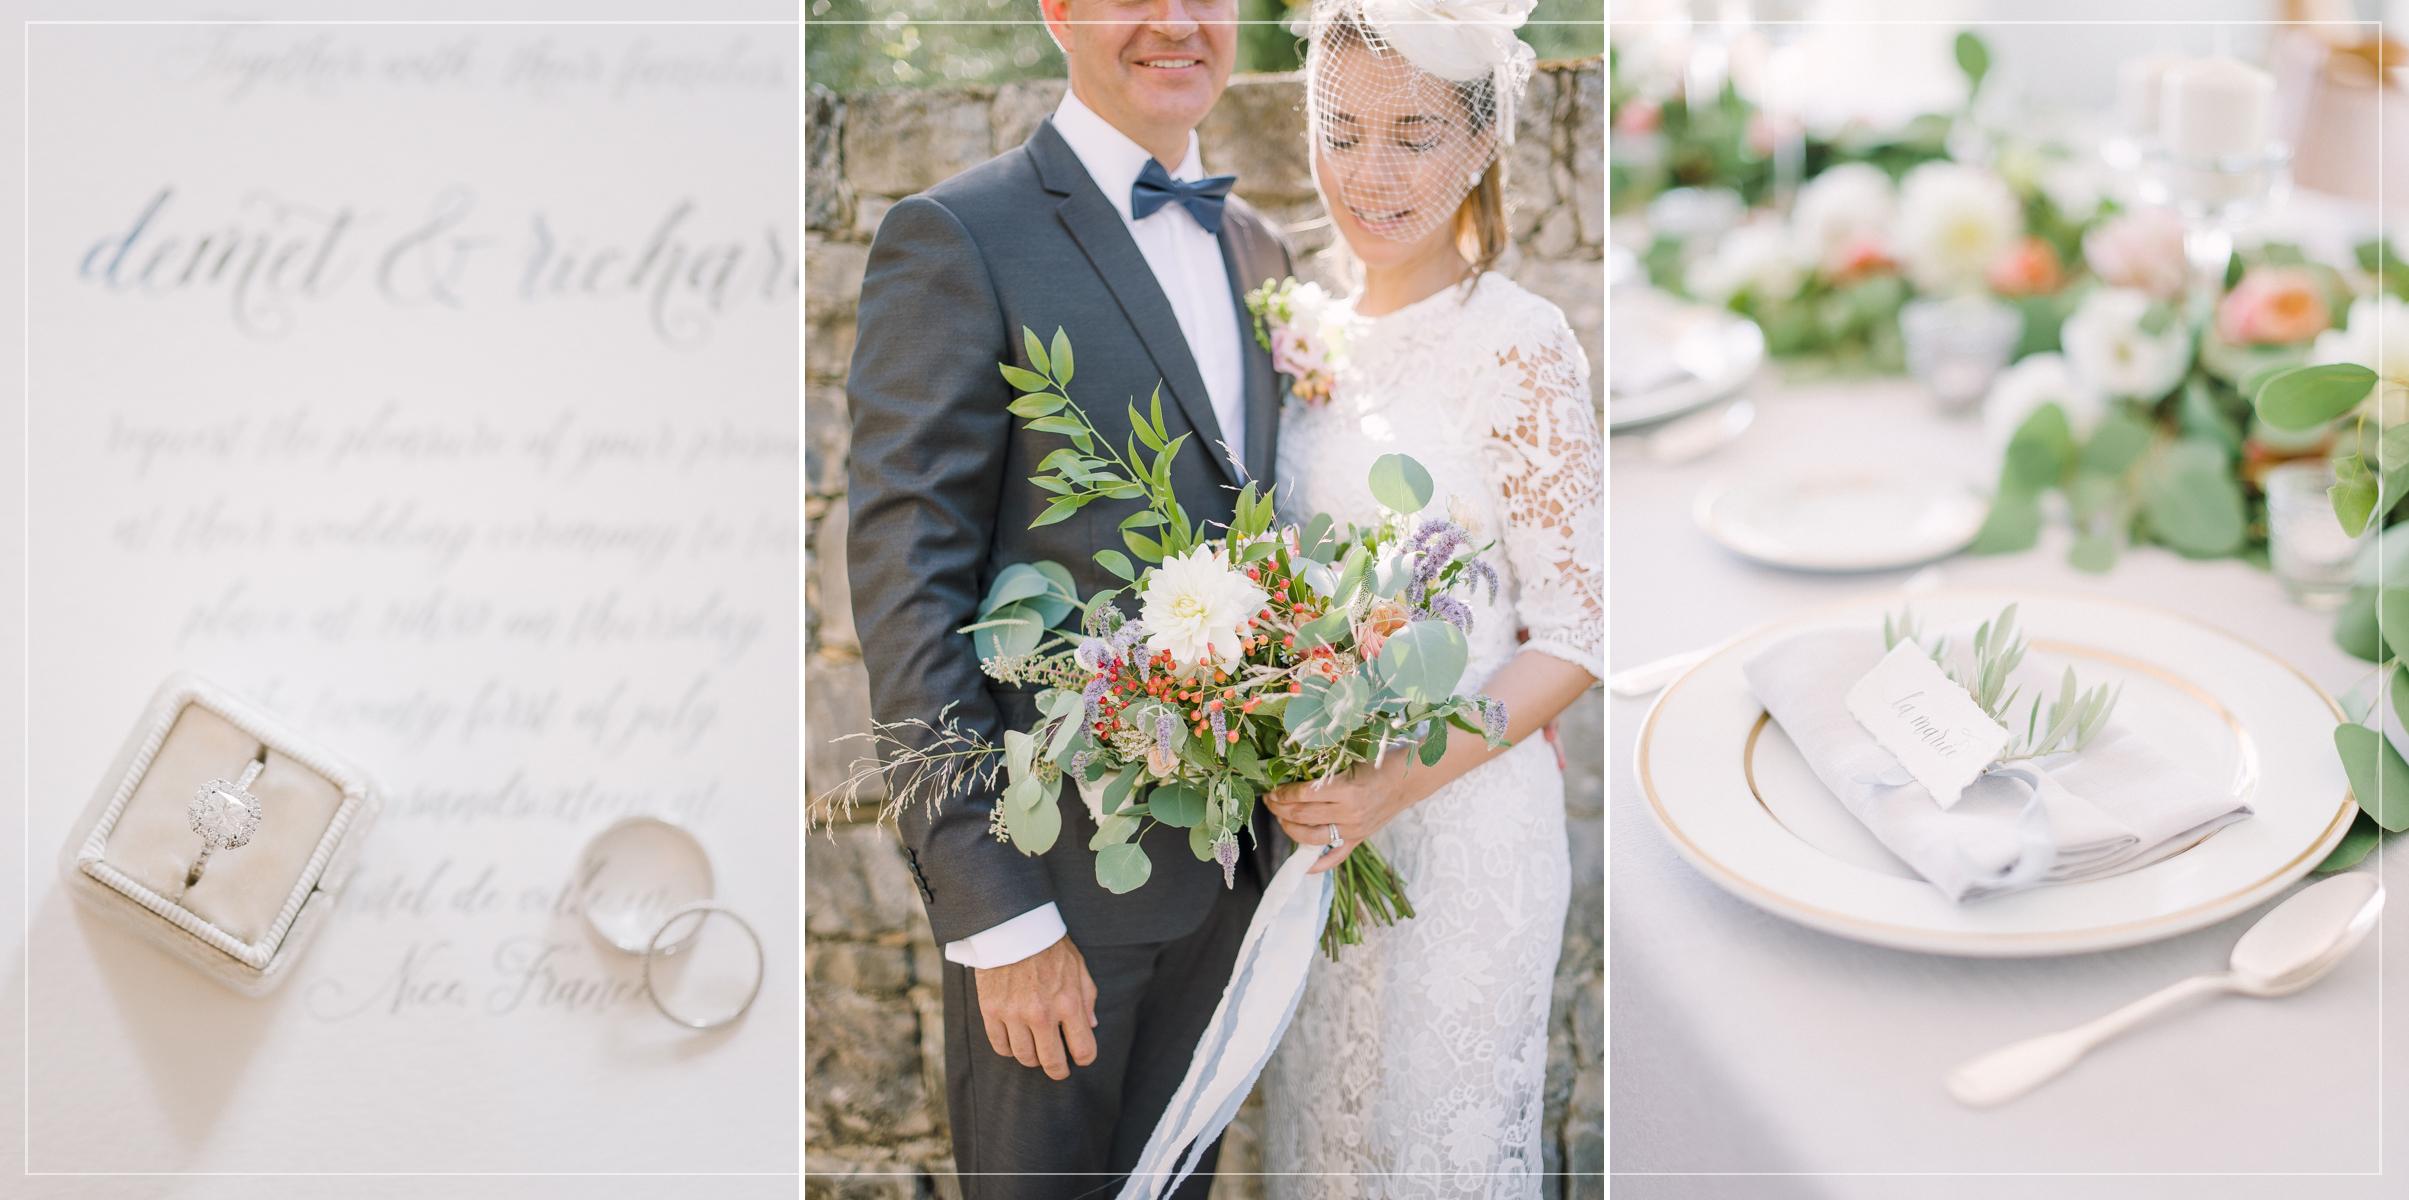 boheme-moon-wedding-photography-home-10.jpg